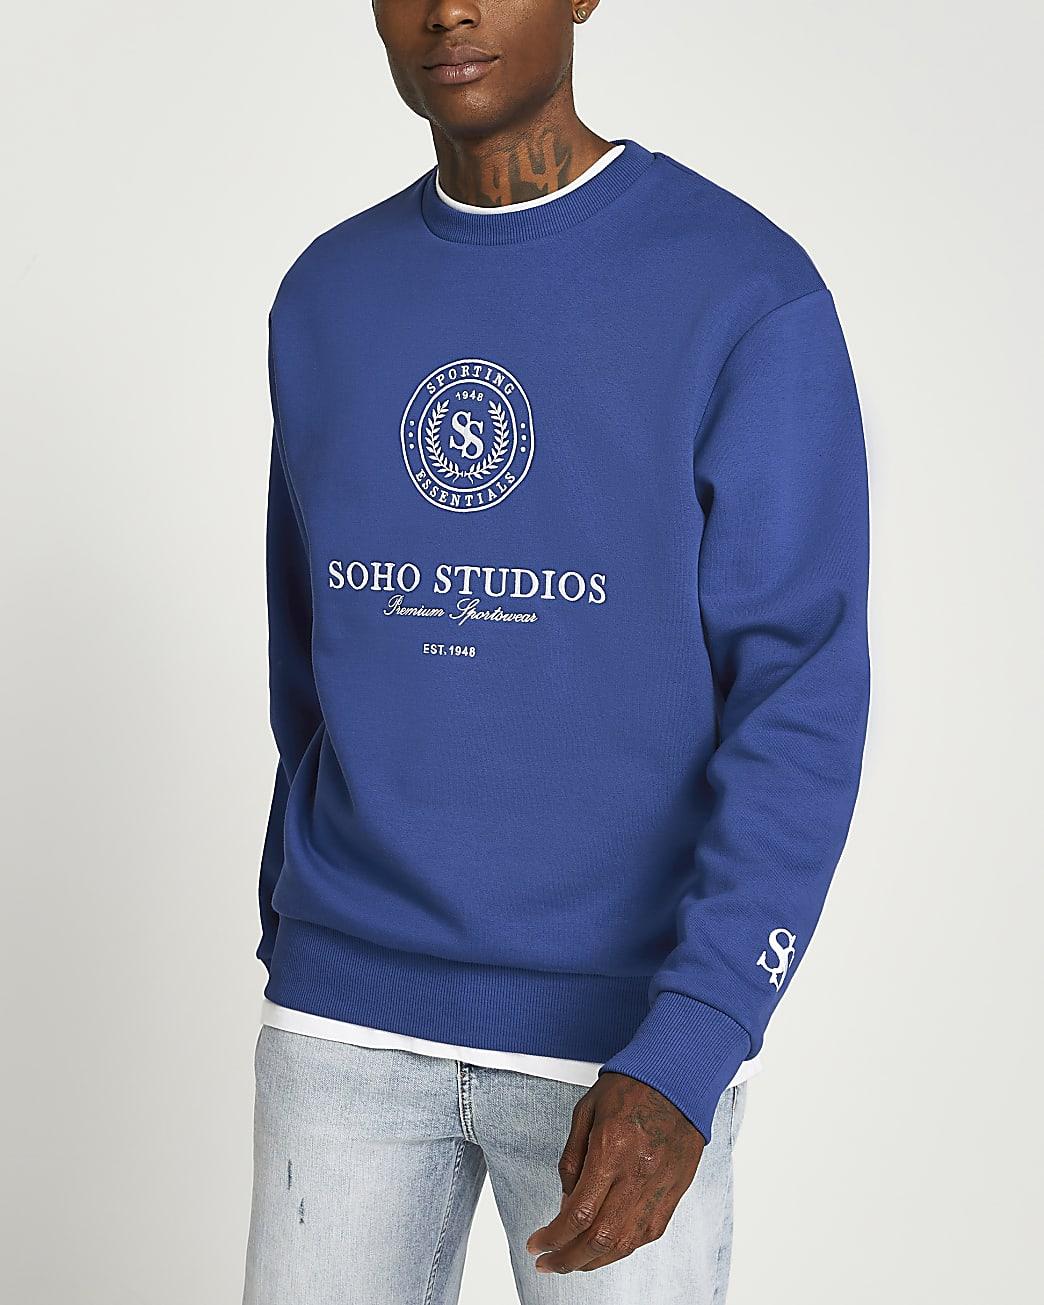 Blue graphic crew neck sweatshirt